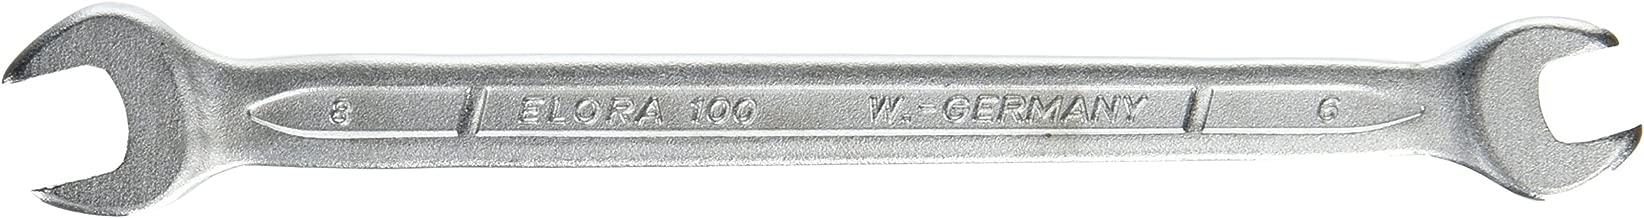 Tankdeckel mit Schl/üssel 102746-28